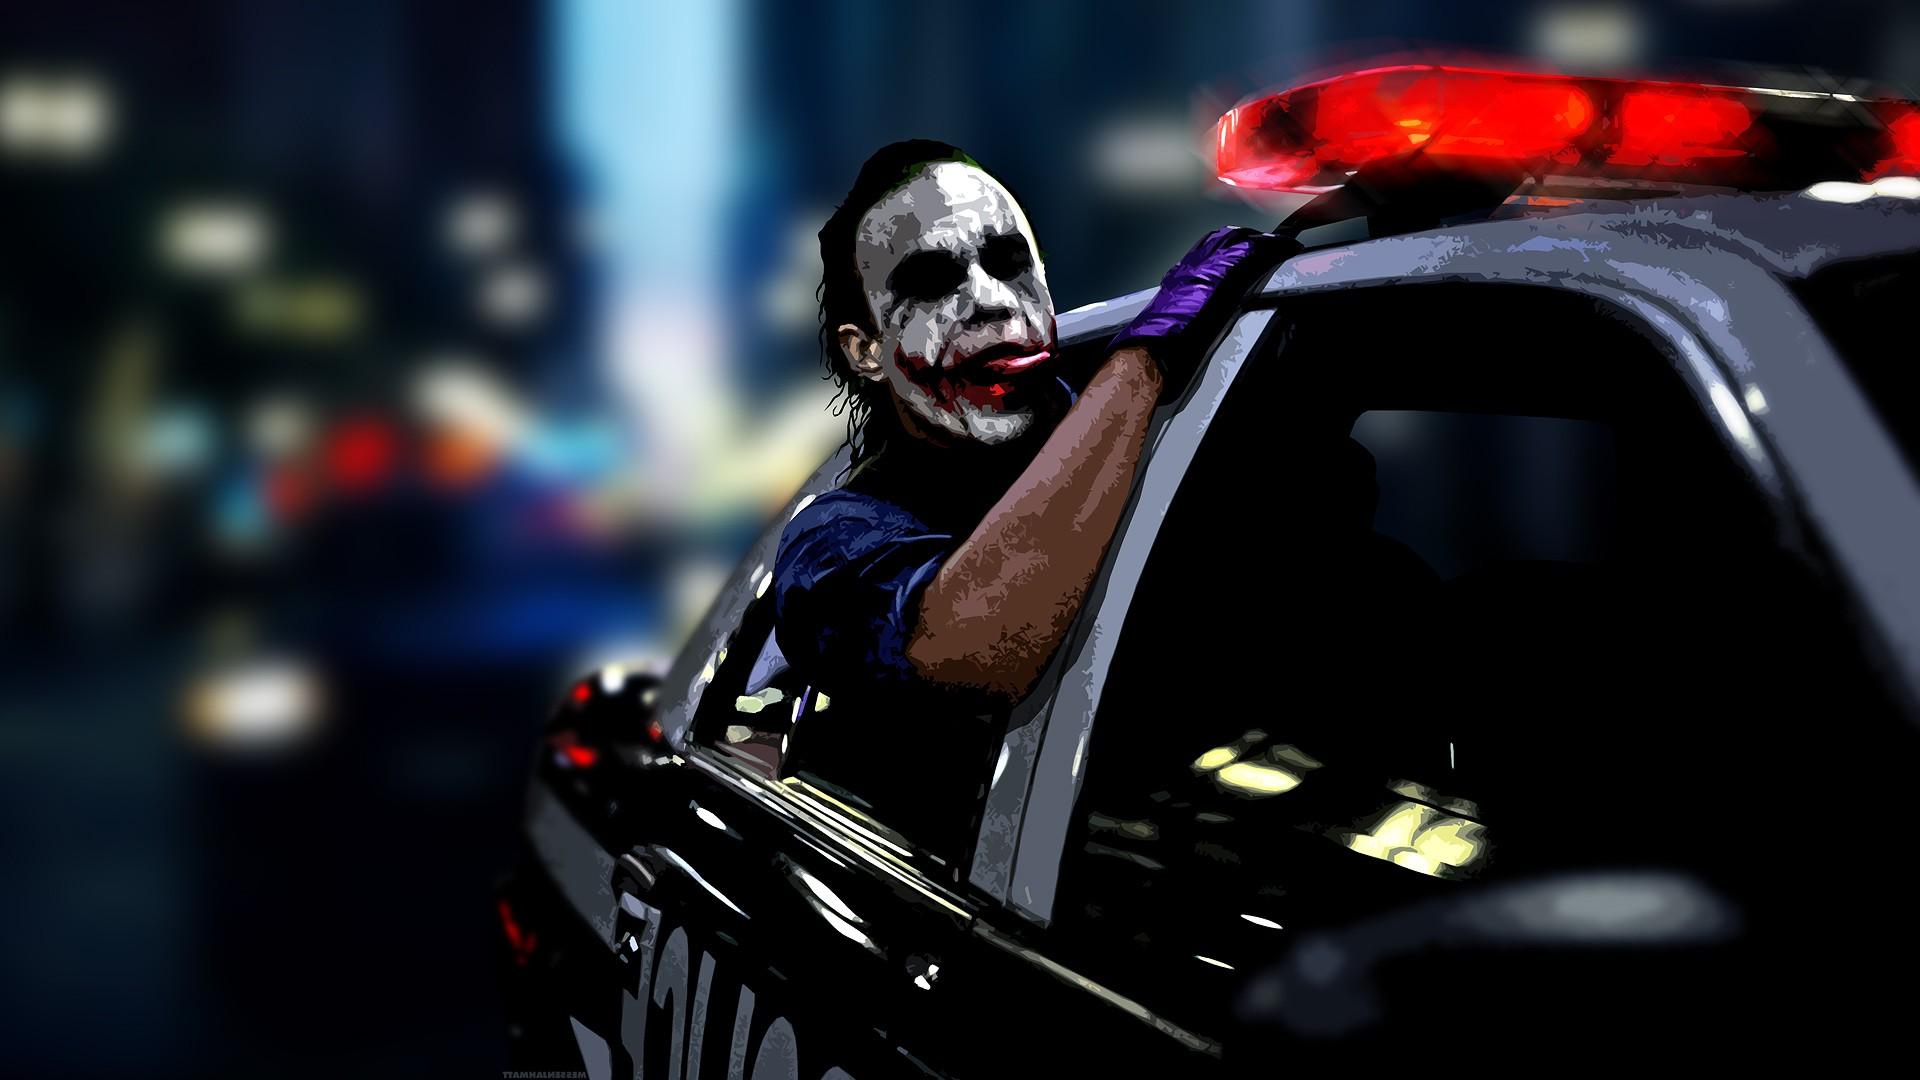 Beautiful Wallpaper Macbook Joker - digital-art-police-anime-car-vehicle-Batman-Joker-Heath-Ledger-MessenjahMatt-darkness-1920x1080-px-automotive-design-personal-protective-equipment-motor-vehicle-city-car-797991  Collection_559875.jpg